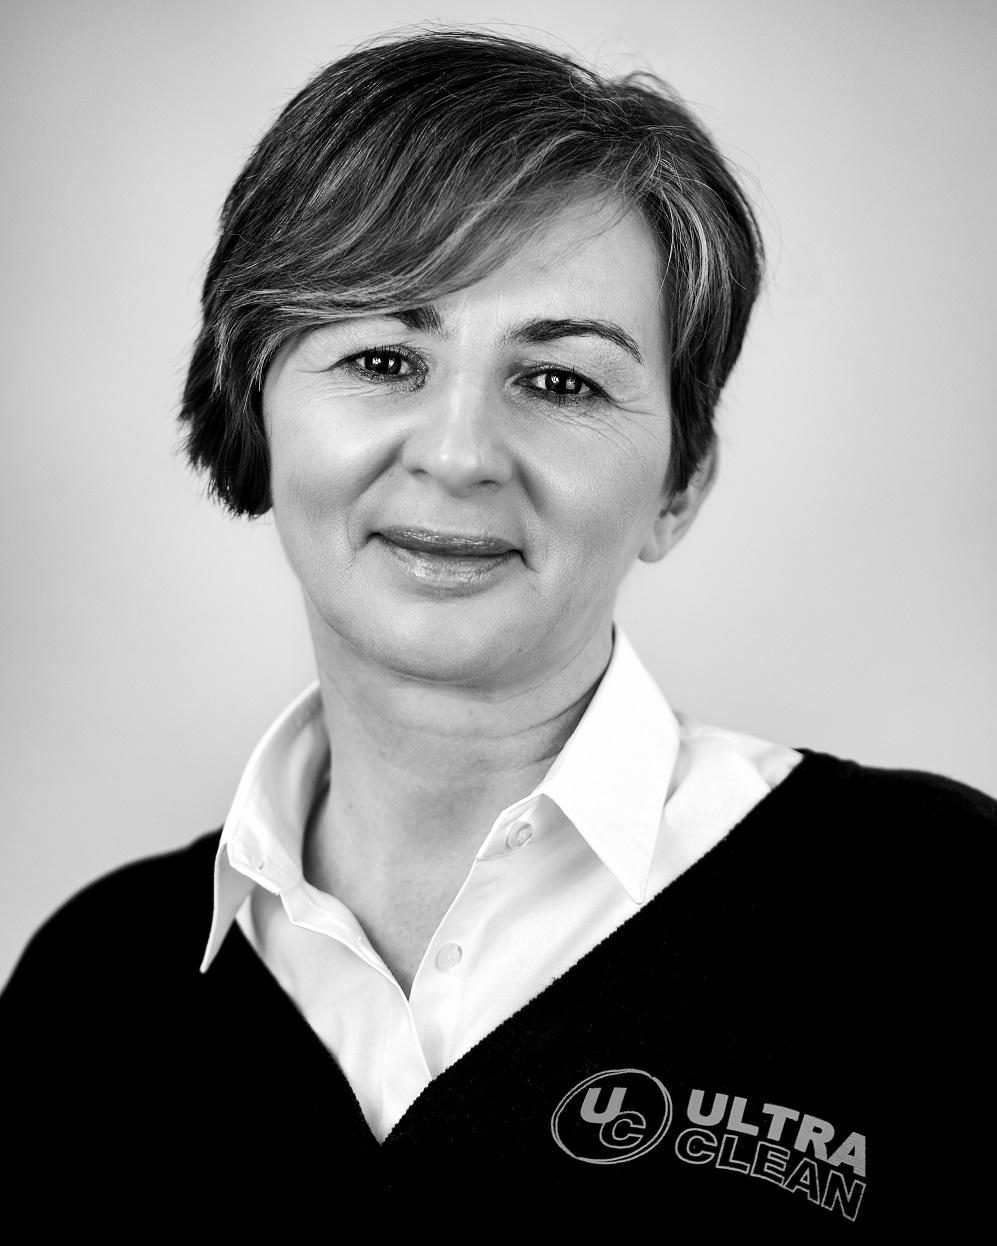 Ultra clean Tihana Pavlicevic